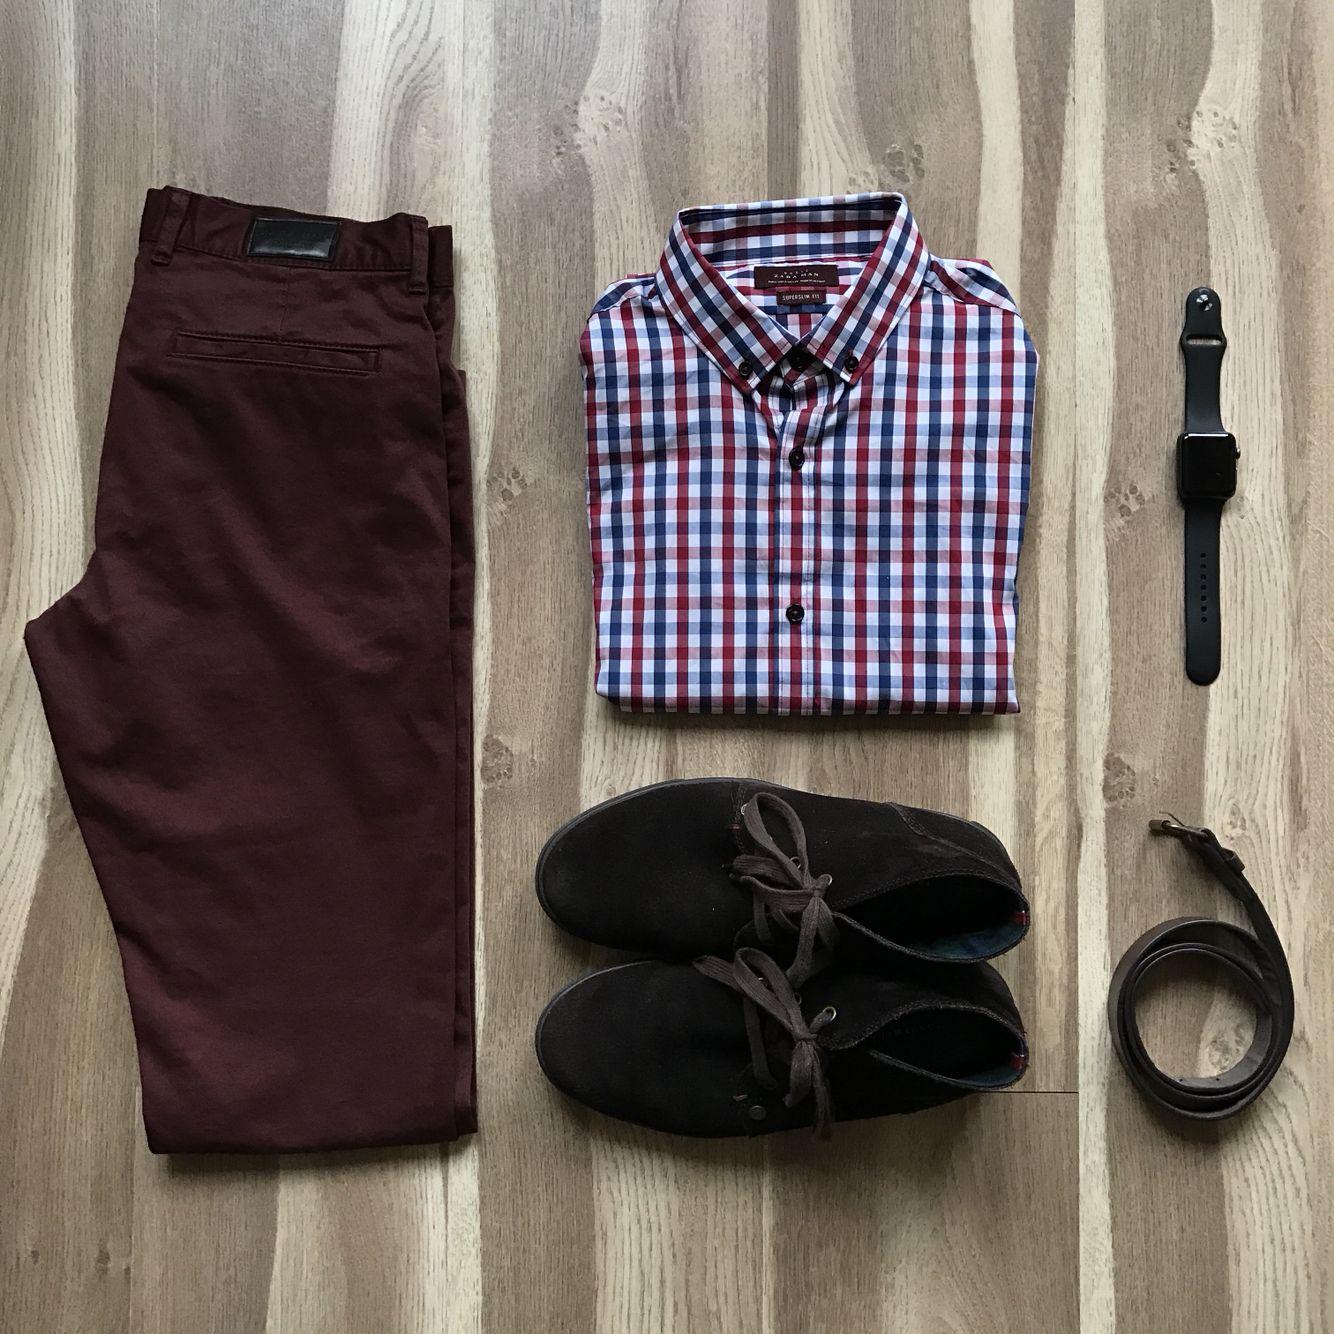 c43ef3a977f Business casual men outfit  shirt (Zara)